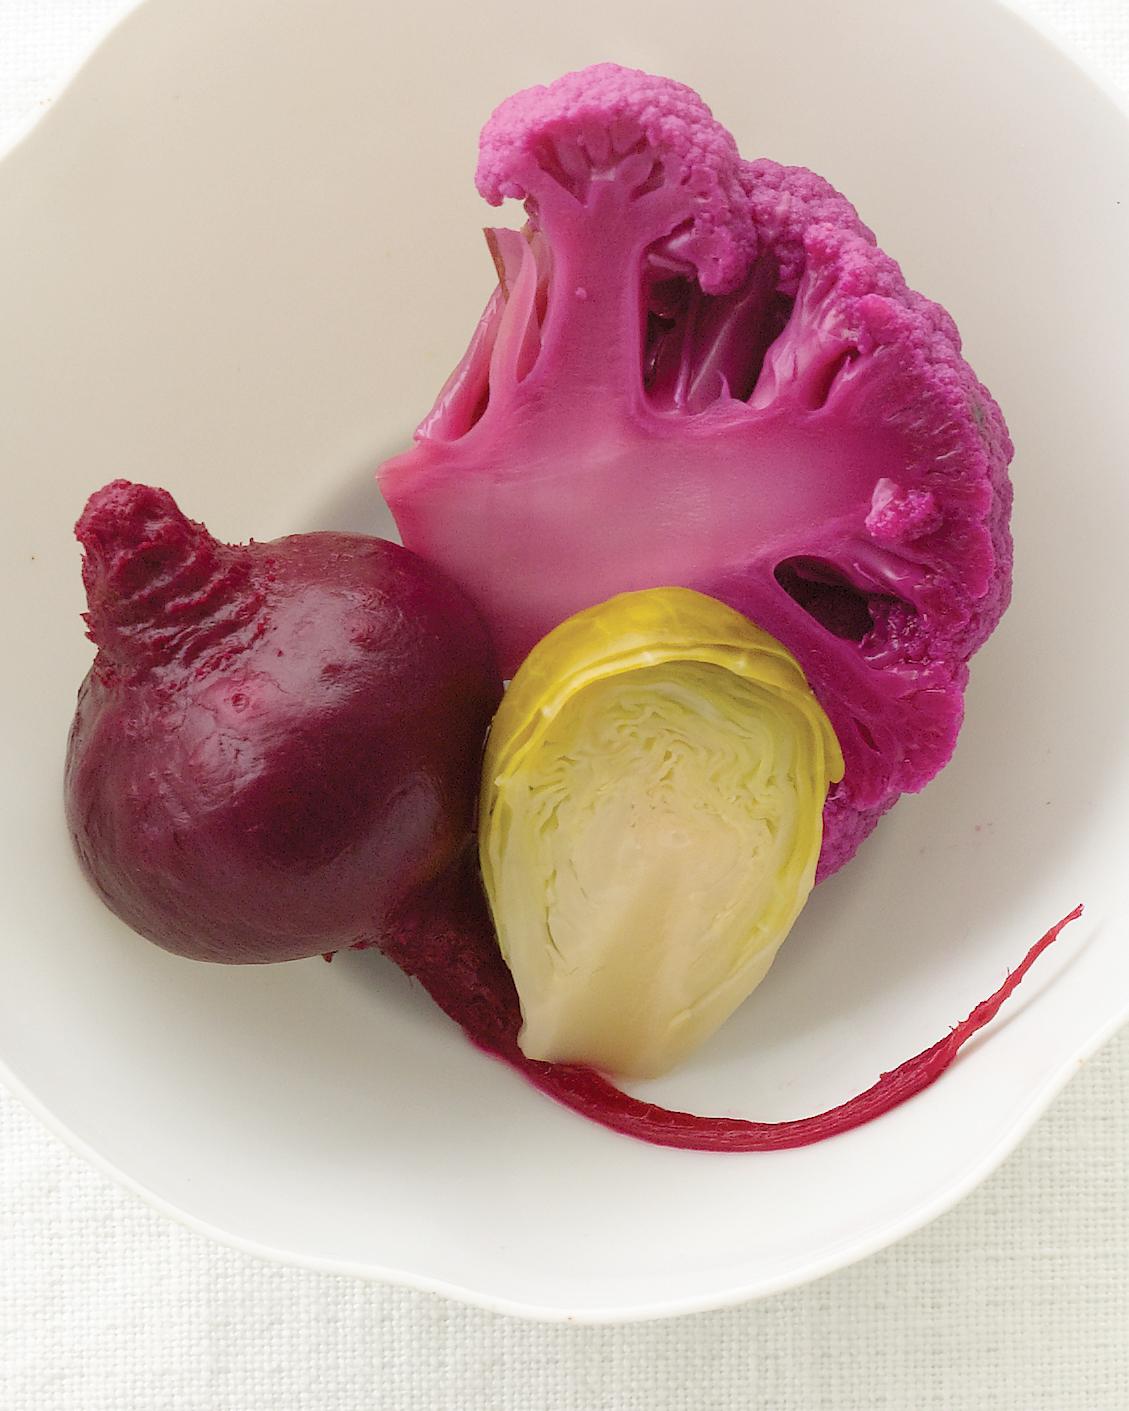 pickled-veggies-0811mwd107509.jpg